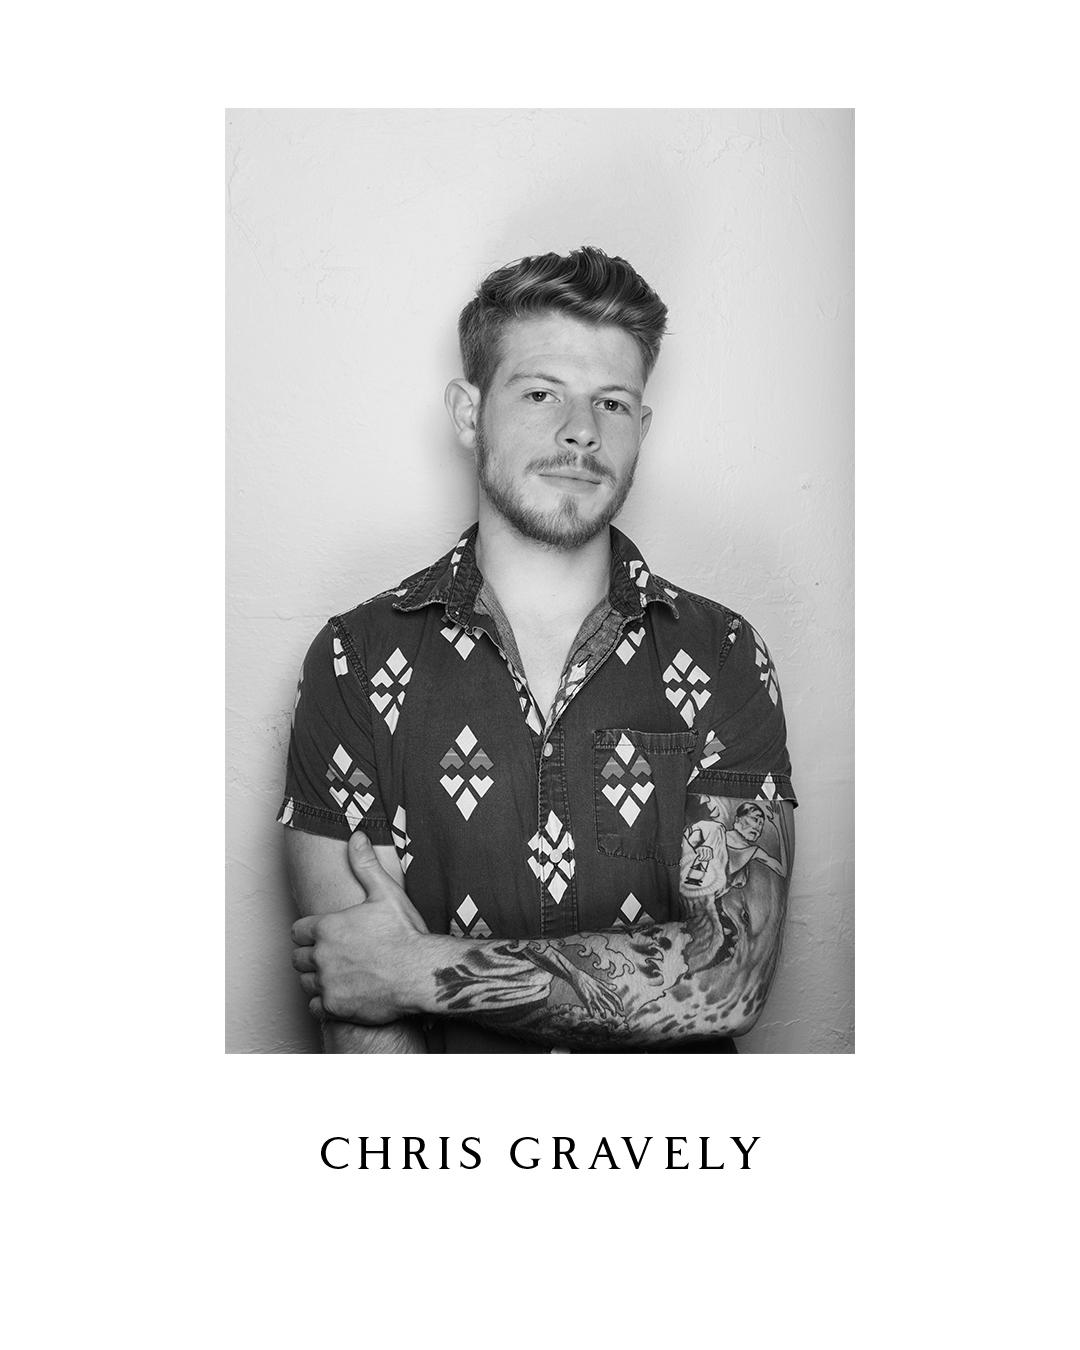 CHRIS GRAVELY - COMPOSER